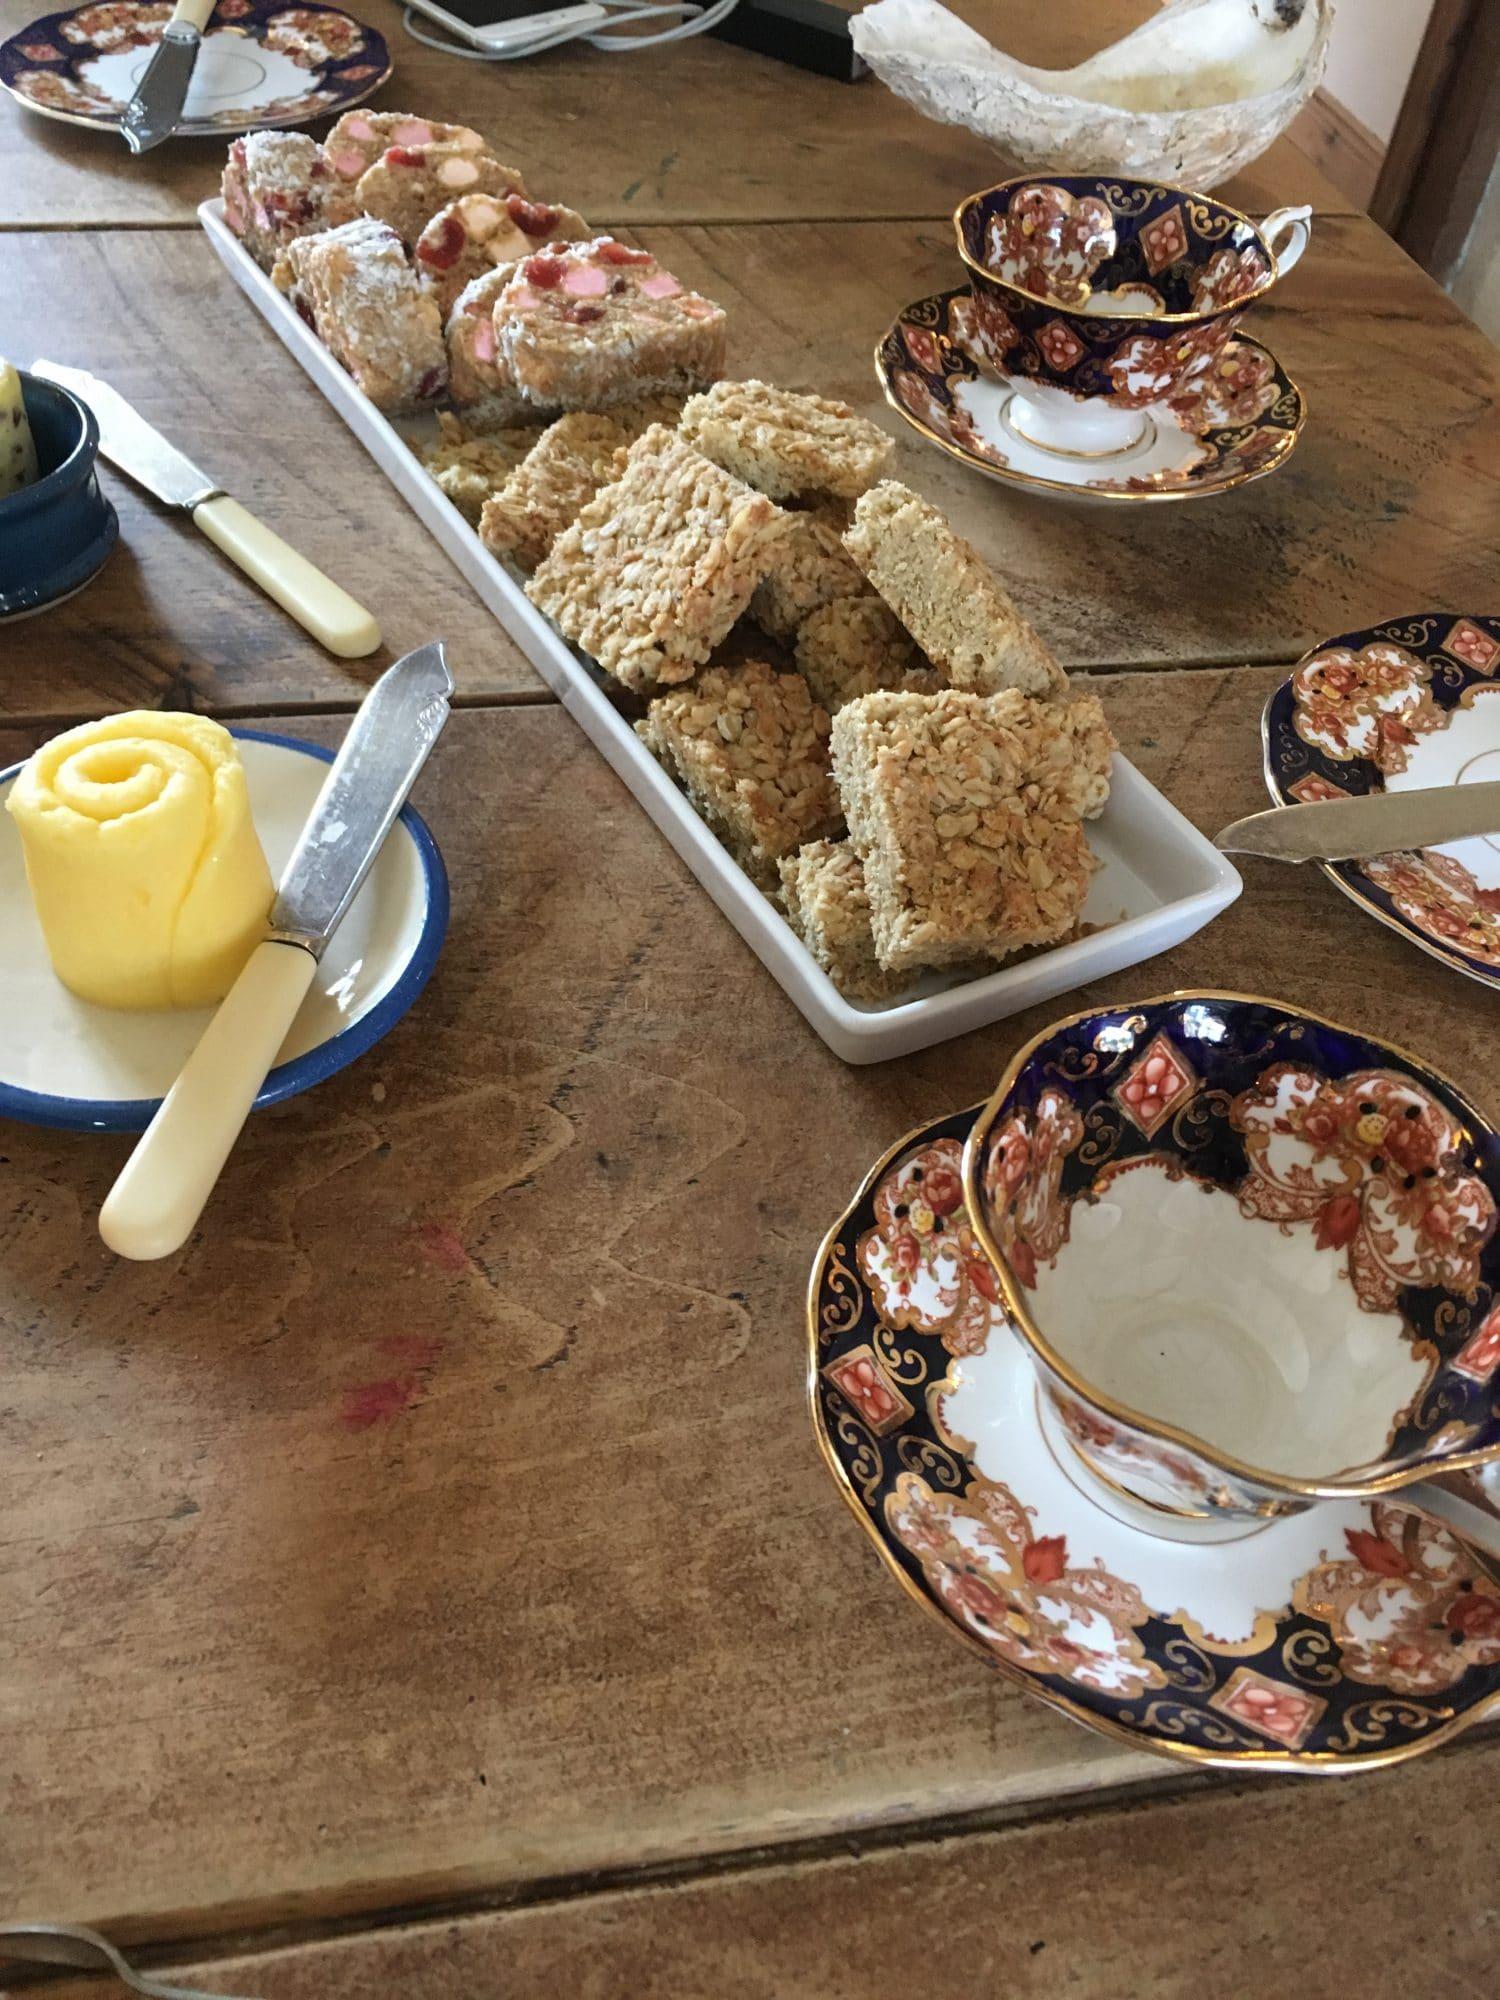 Northern Ireland Weekend Break - NI Food Tours